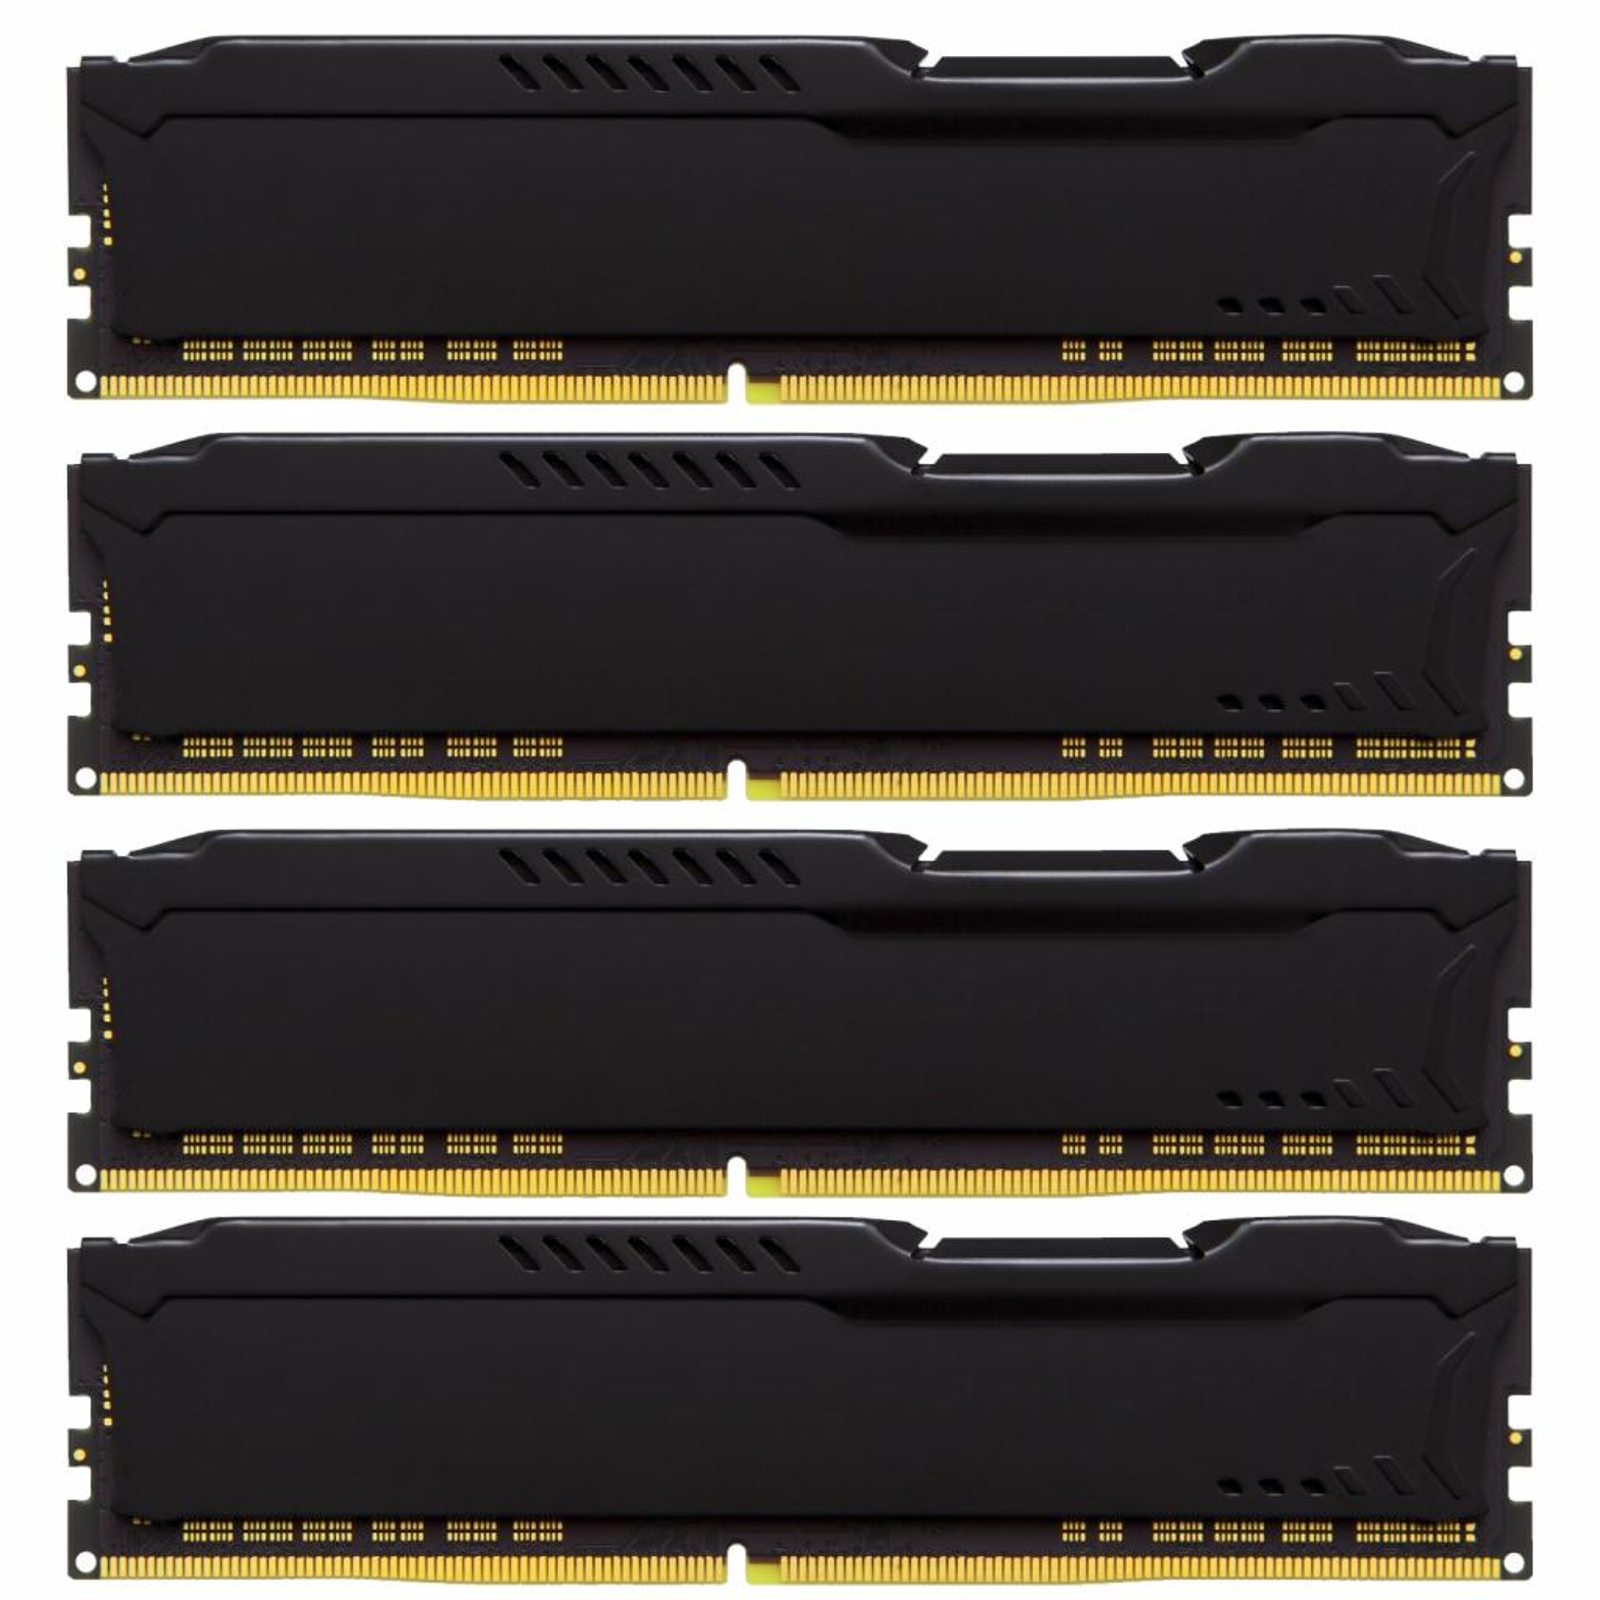 Модуль памяти для компьютера DDR4 64GB (4x16GB) 2133 MHz HyperX FURY Black Kingston (HX421C14FBK4/64) изображение 3